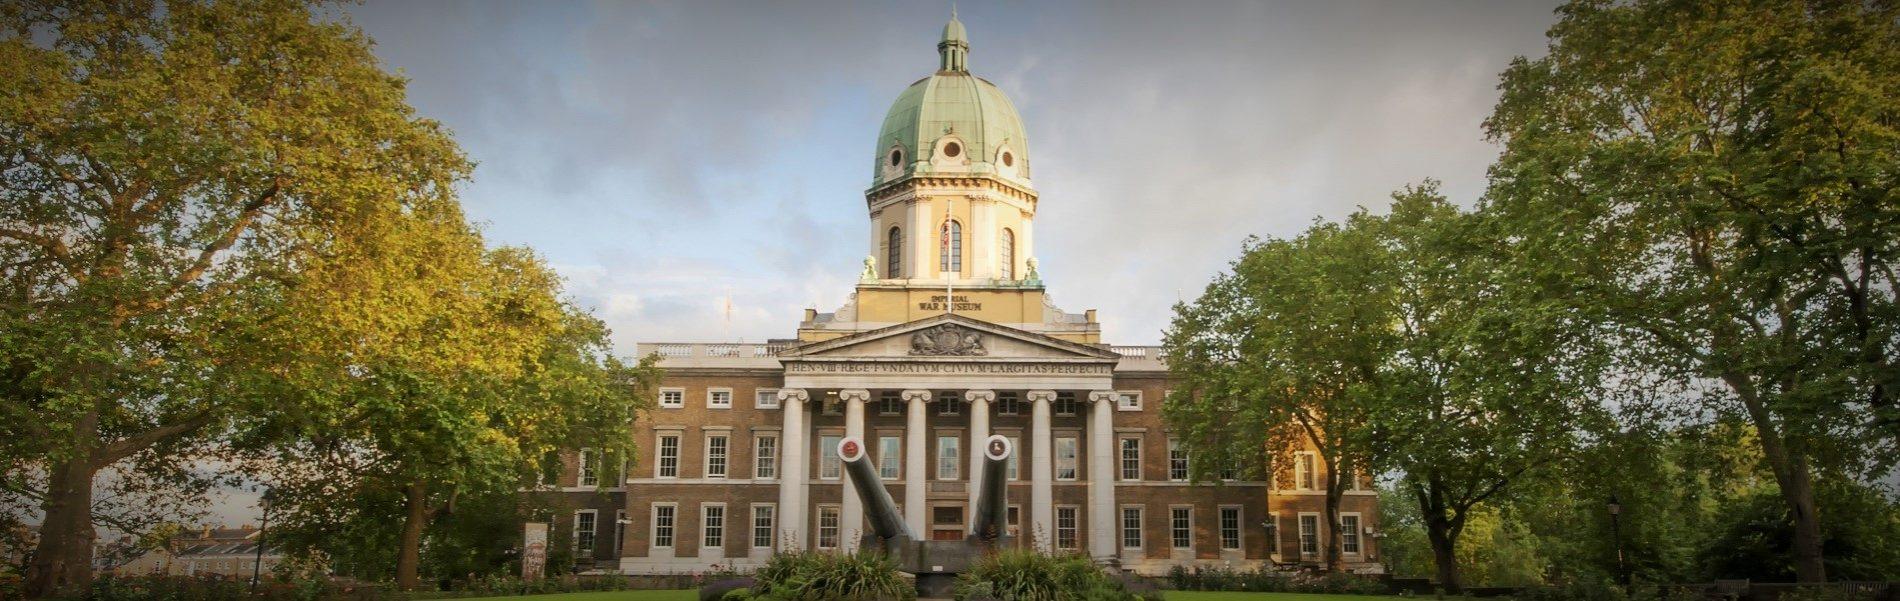 London Tours - Imperial War Museum